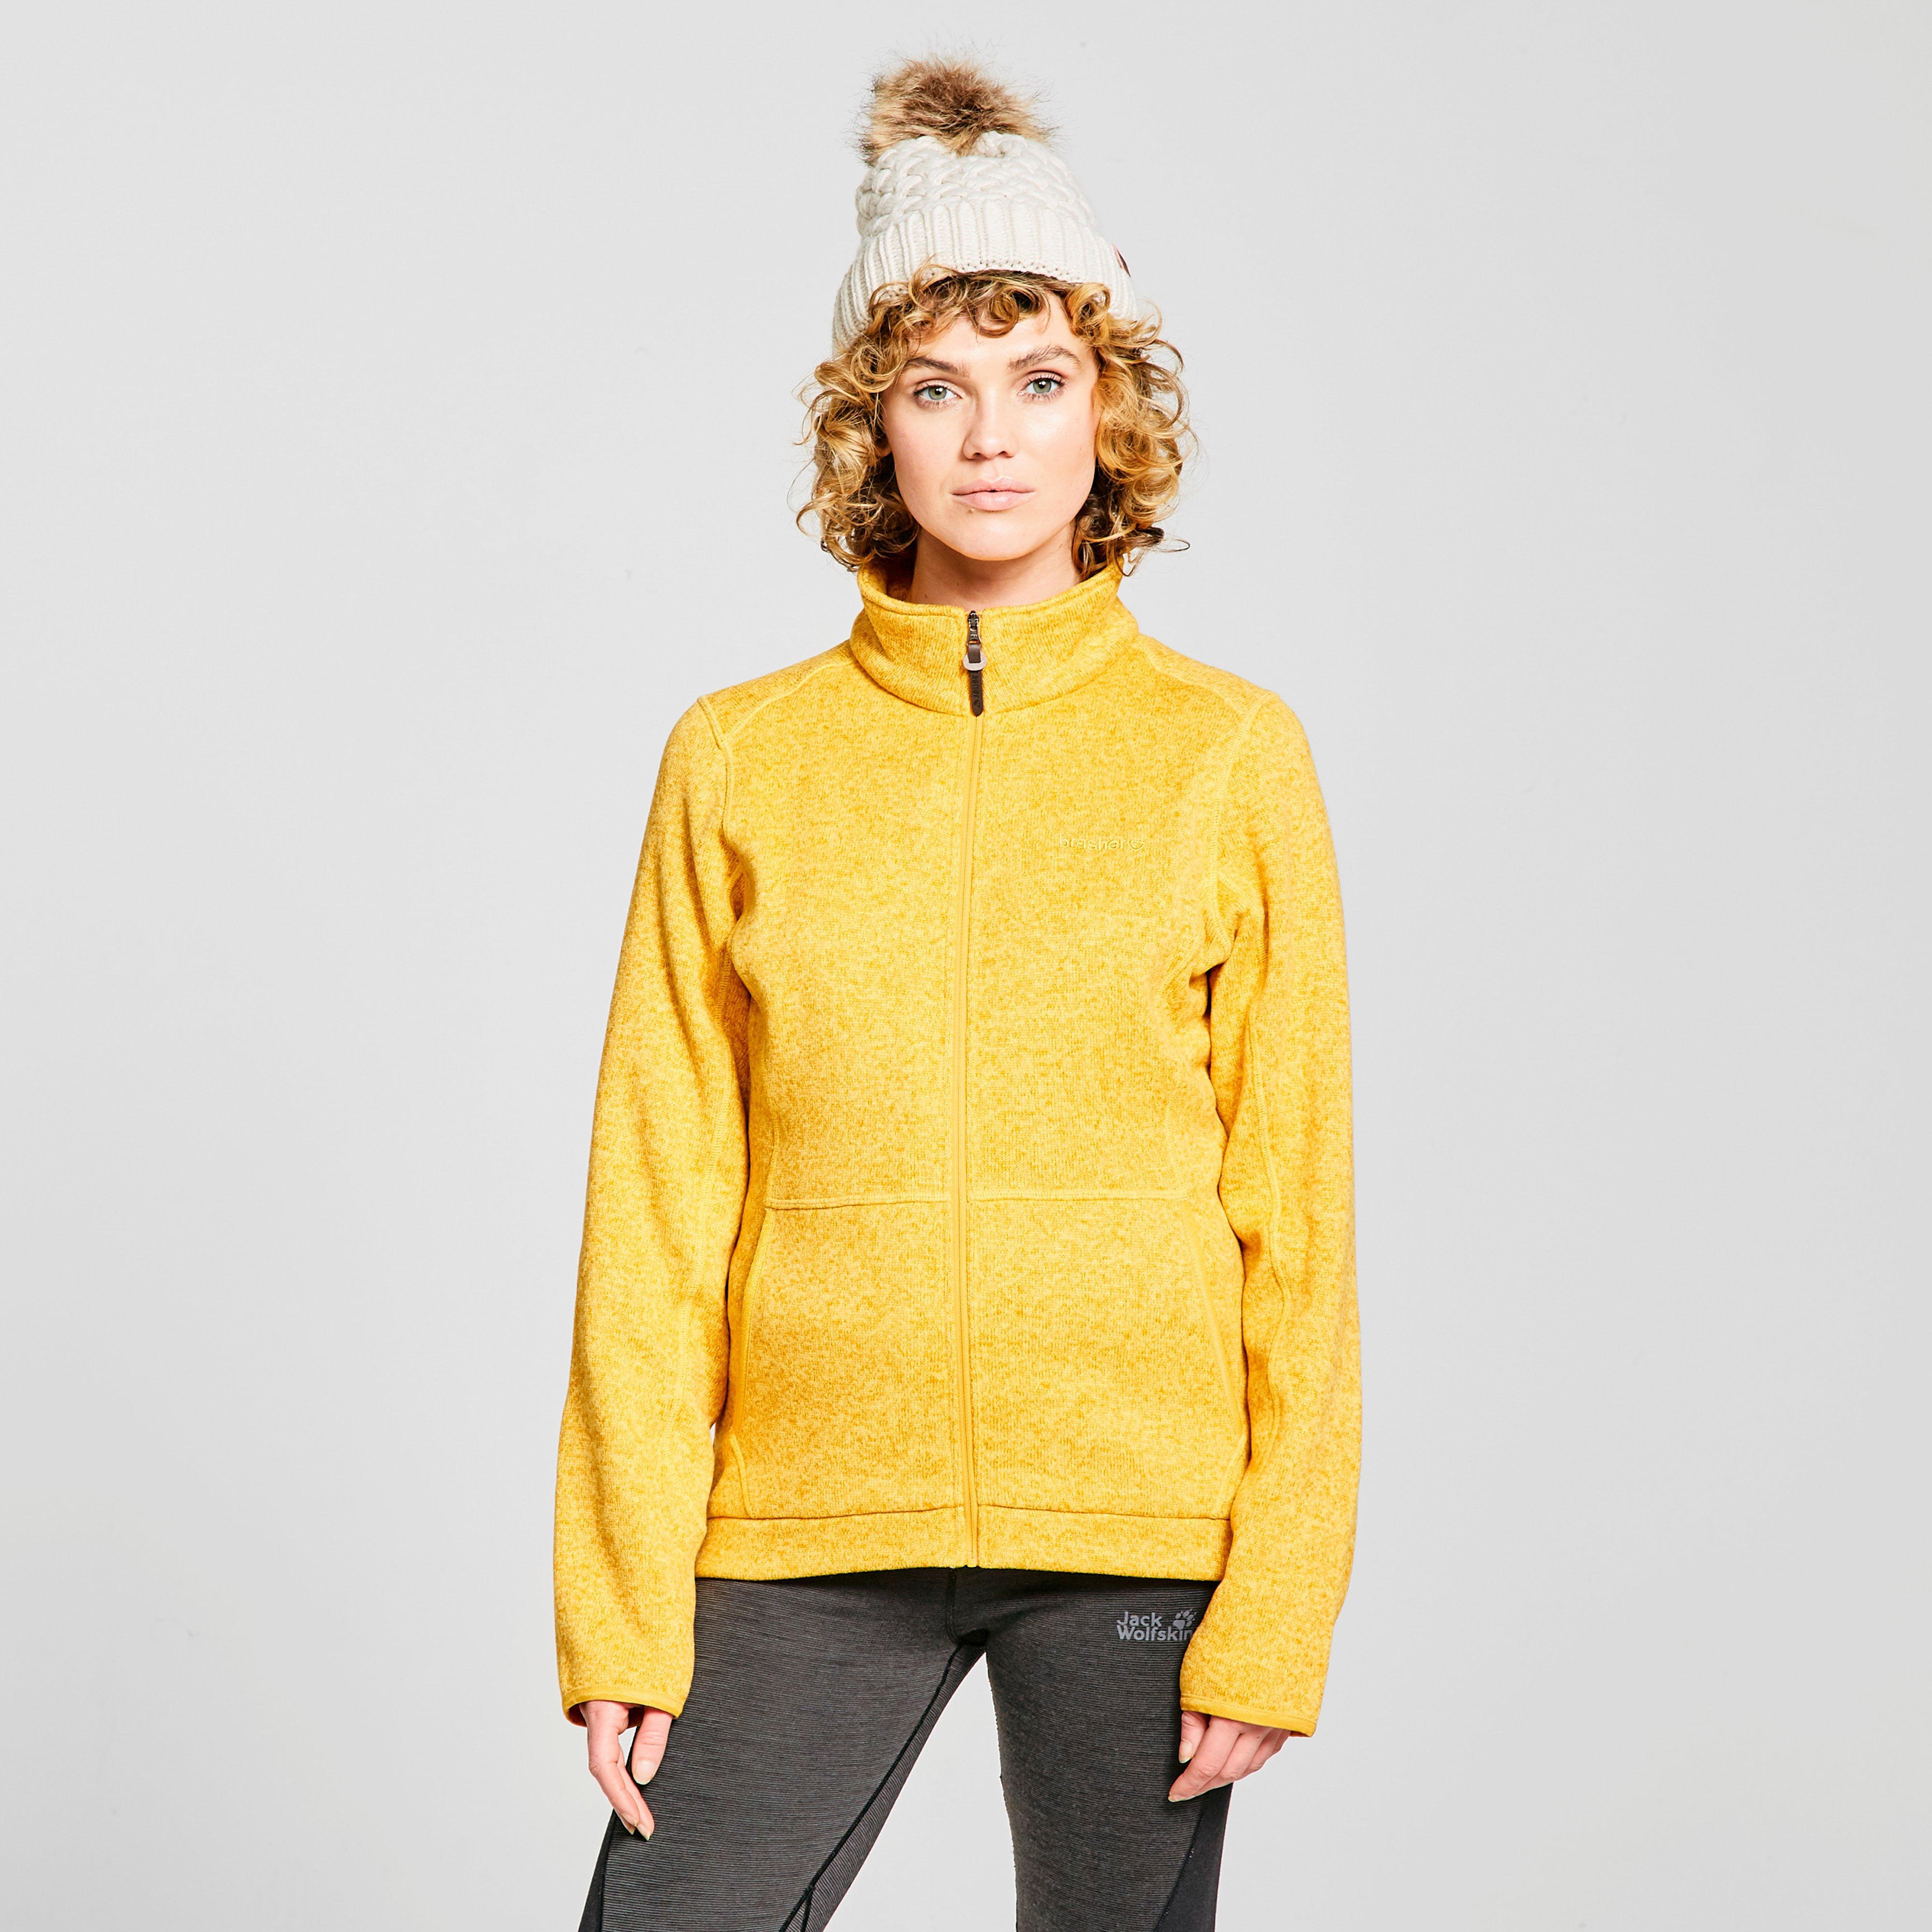 Brasher Womens Rydal Knit Fleece Jacket - Yellow/mus  Yellow/mus